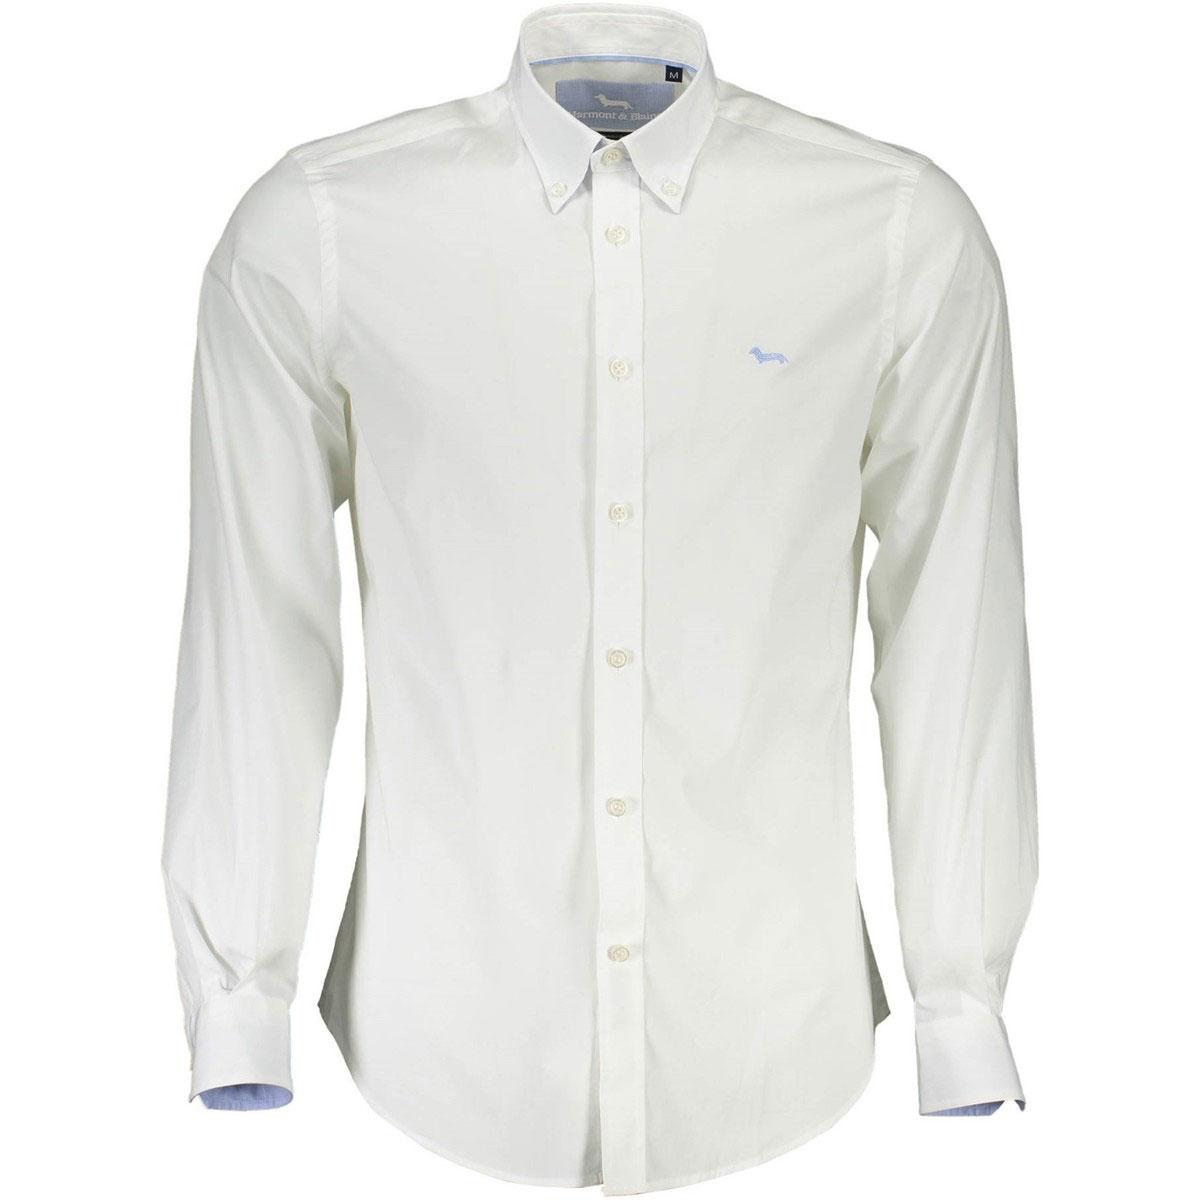 Camicia Uomo Harmont E Blaine Narrow Fit Bianco